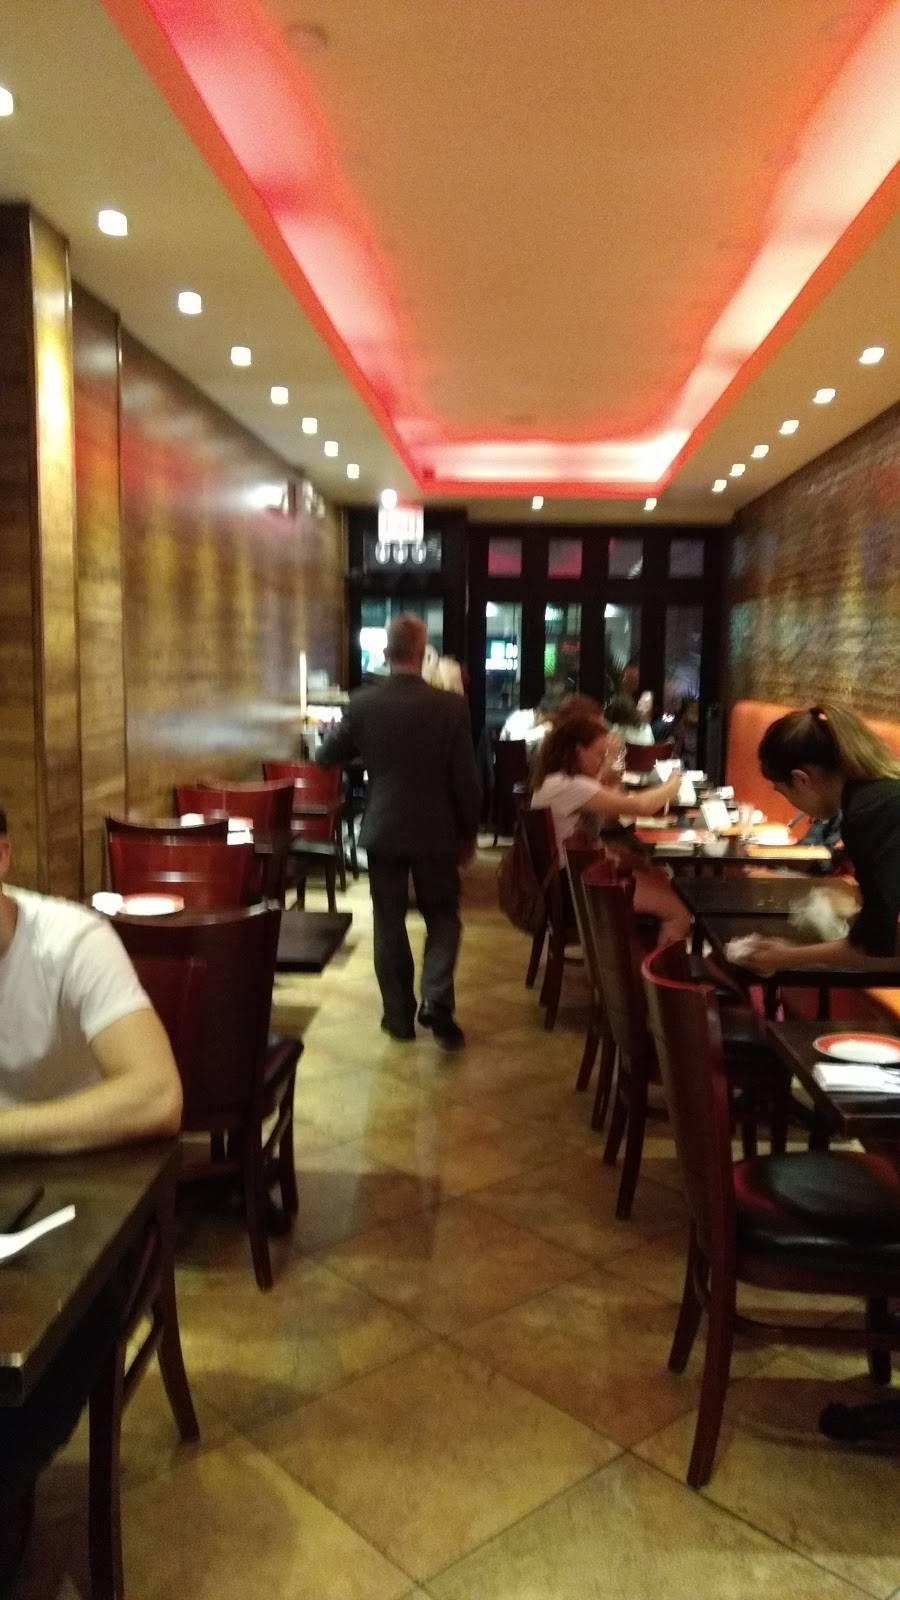 Spice Saigon | restaurant | 1237 1st Avenue, New York, NY 10065, USA | 2126280088 OR +1 212-628-0088